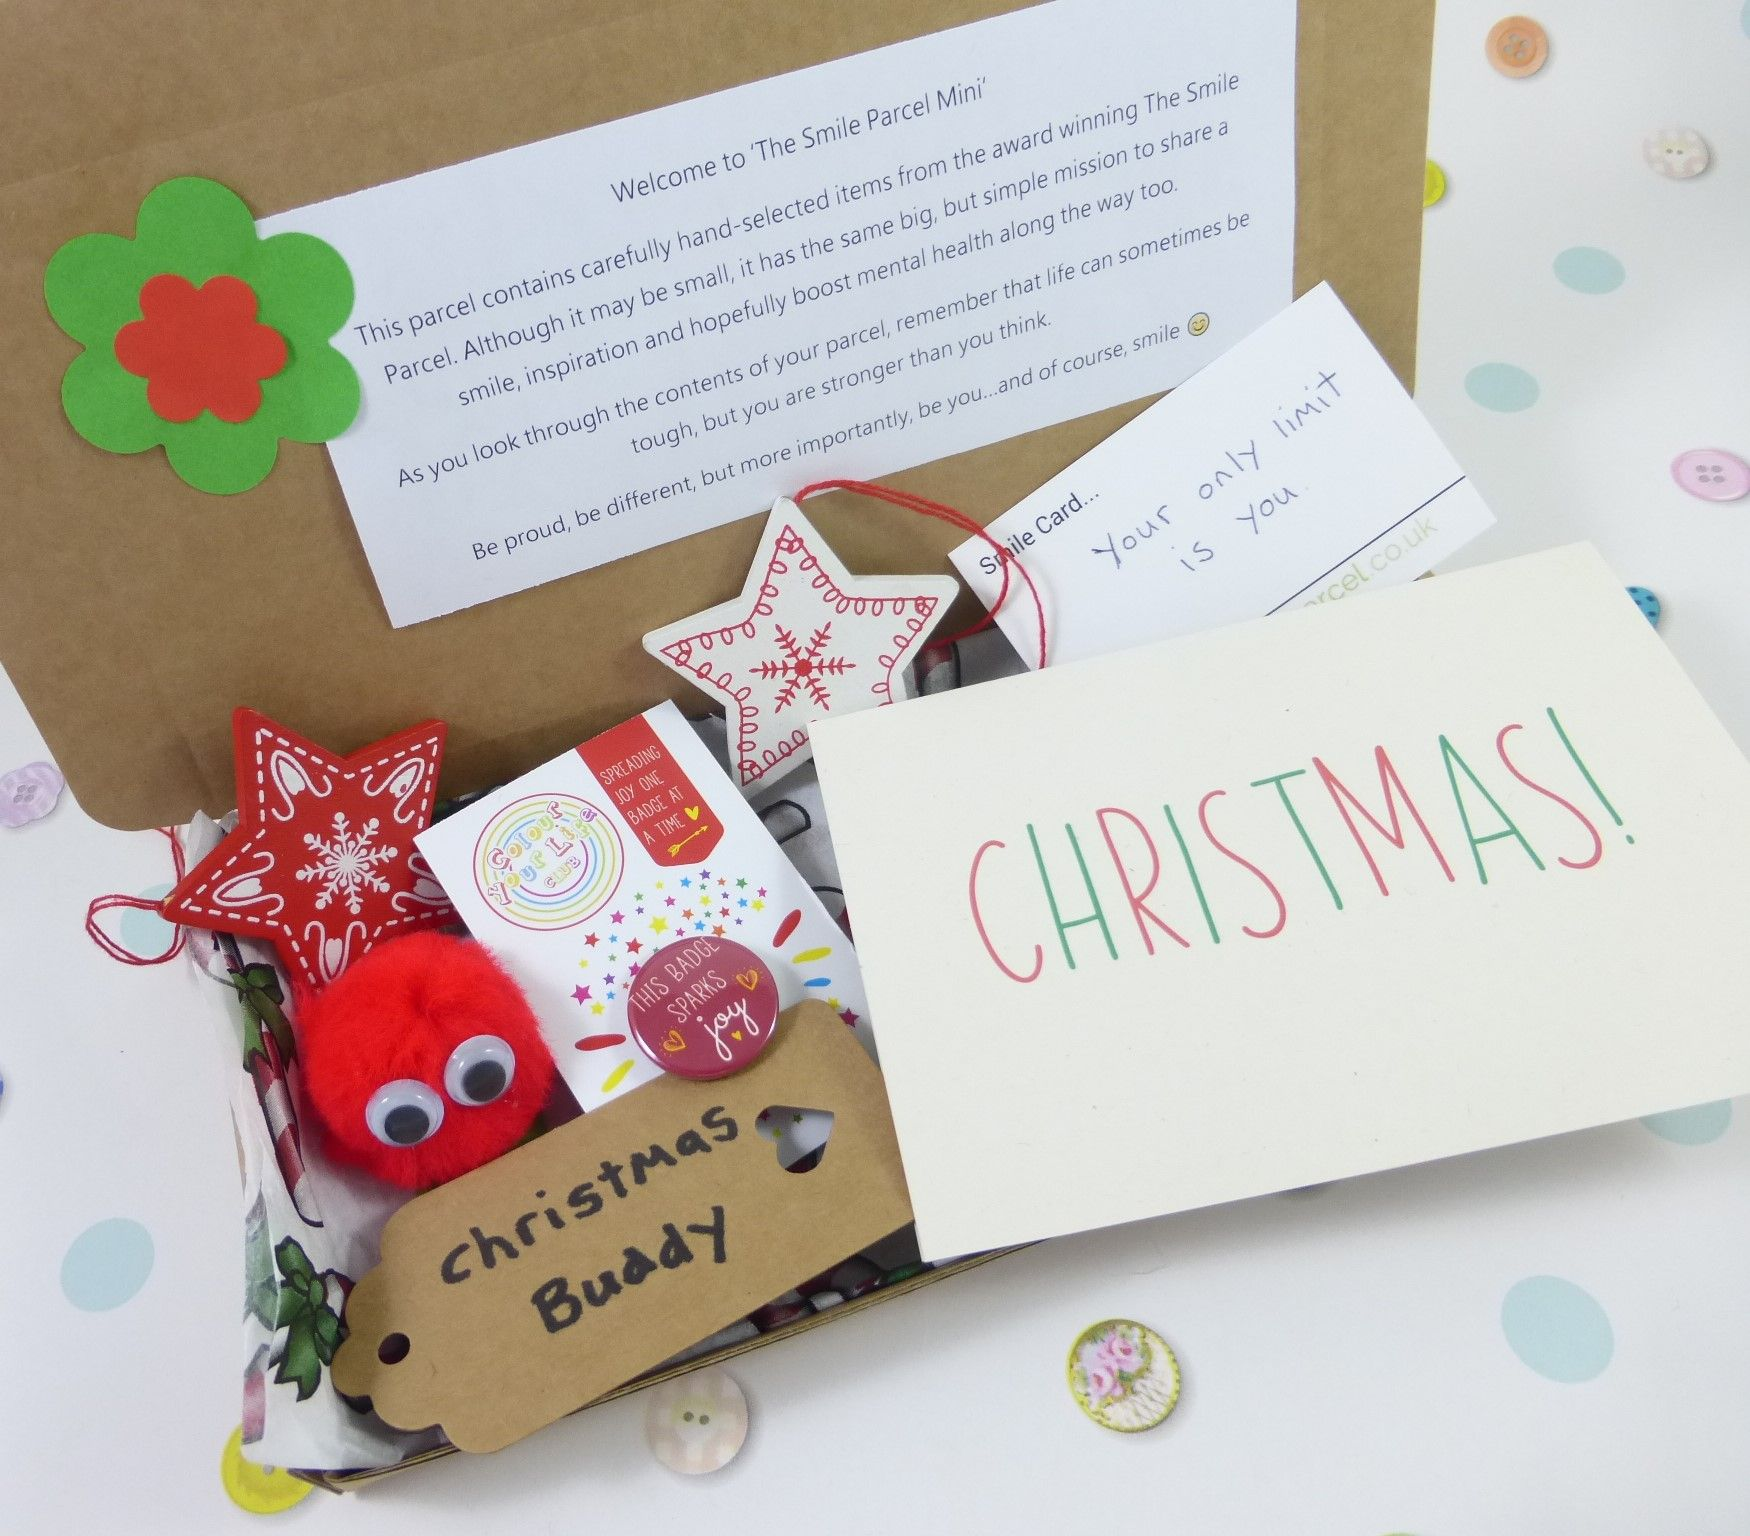 Christmas Stars, Letterbox Friendly, Pick Me Up Gift – The Smile Parcel Mini Kind Shop